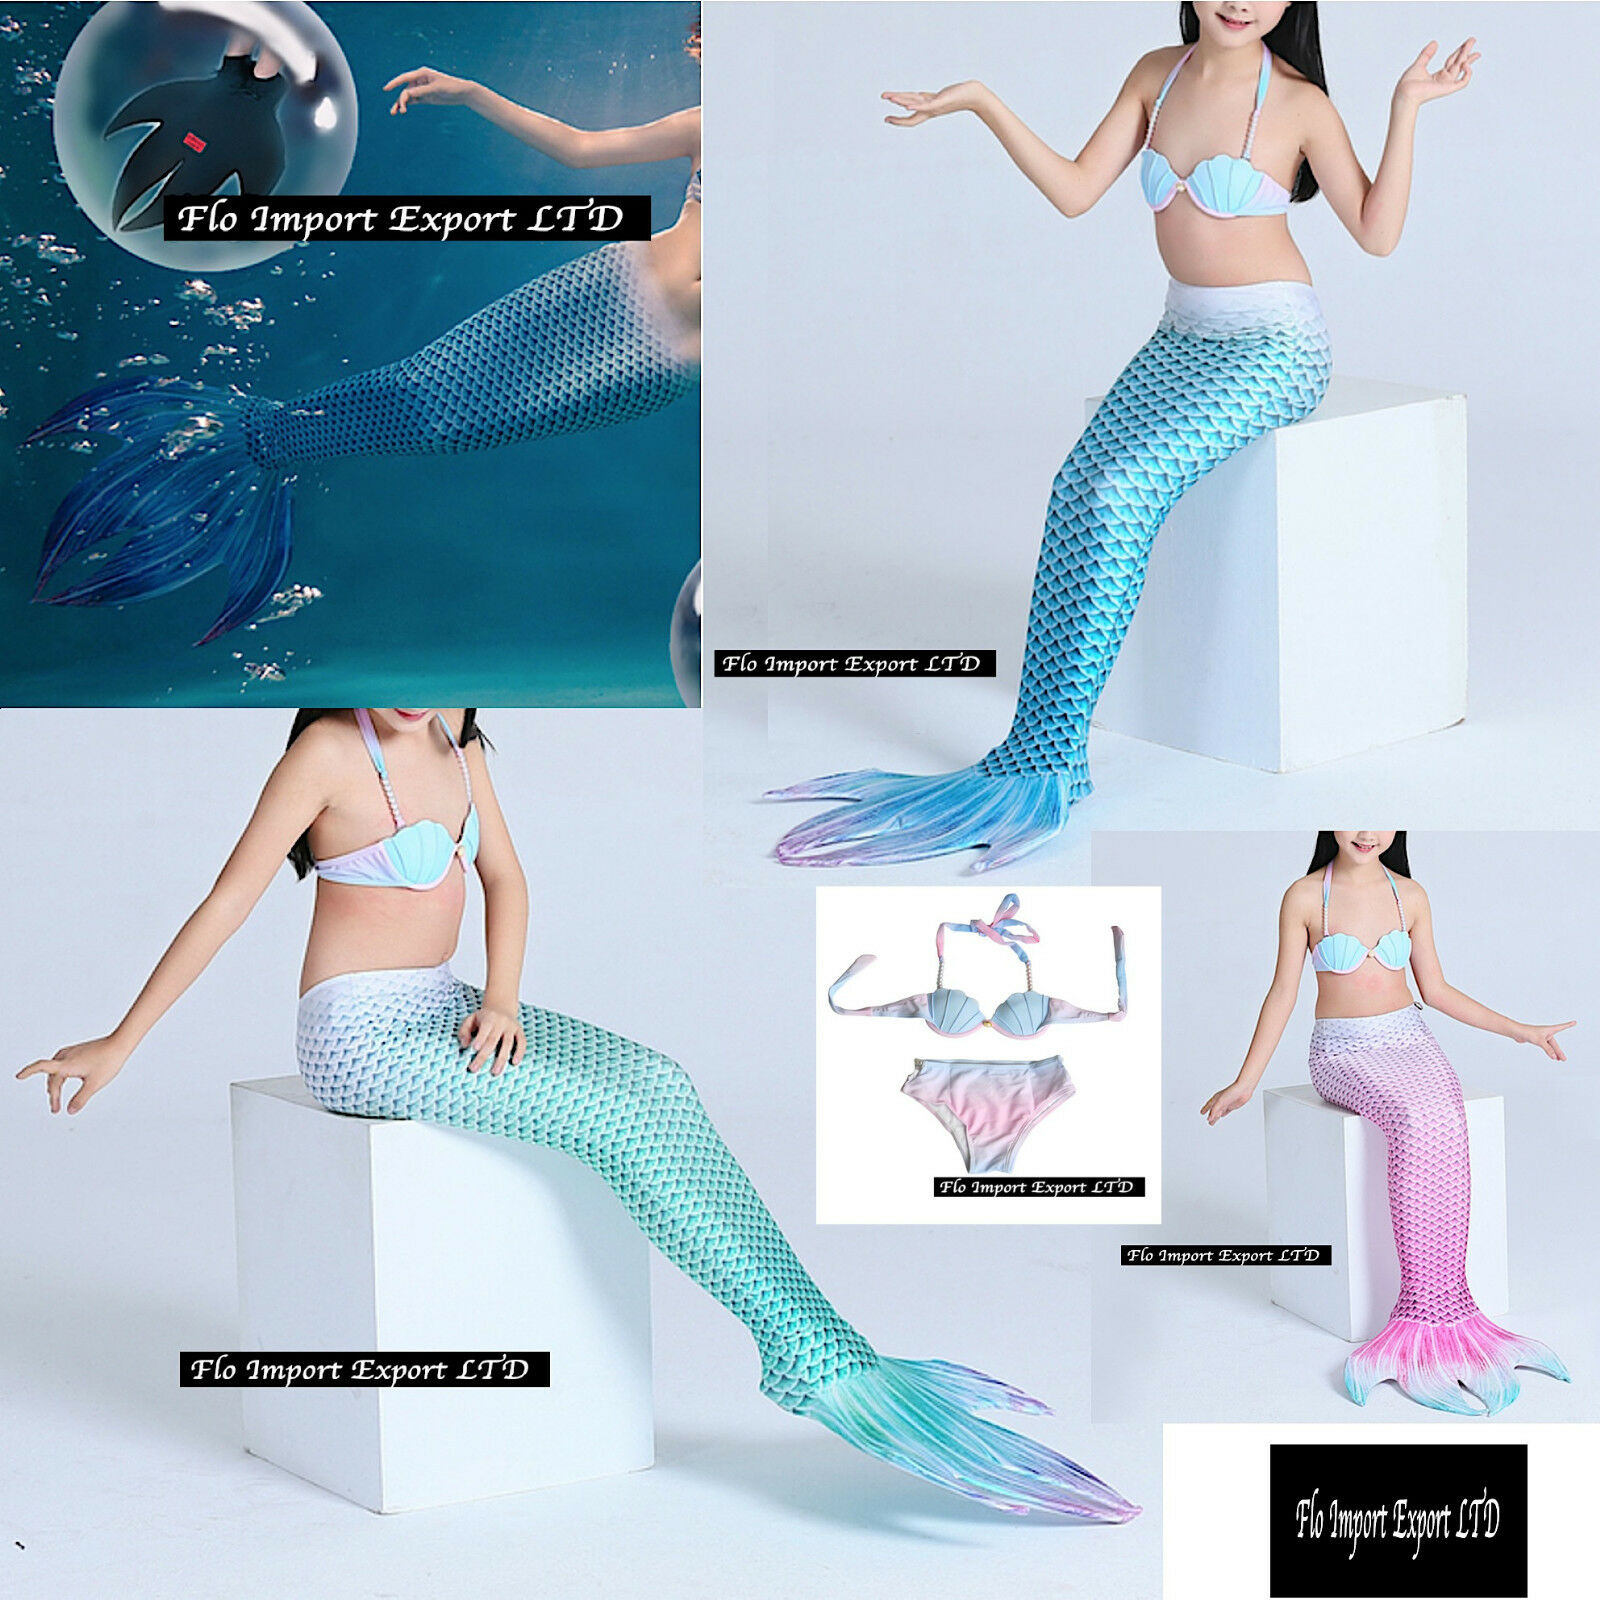 Costume Coda Sirena 4 Punte 6-12 Girl Swimsuit Mermaid Tail Mare Piscina SMZ013